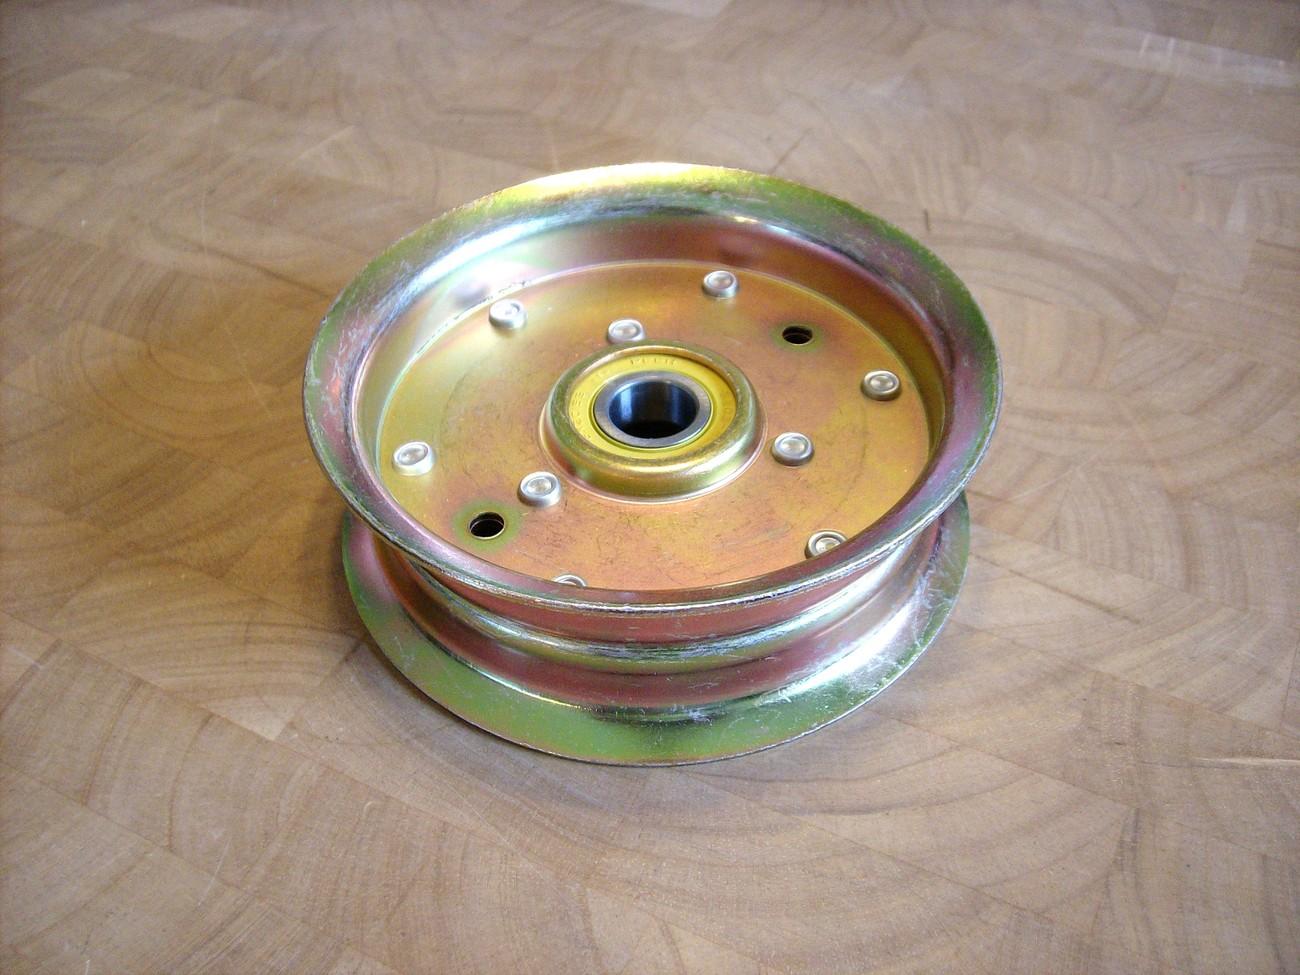 John Deere, Scotts deck idler pulley L100, L105, L107, L108, GY20110, GY20629